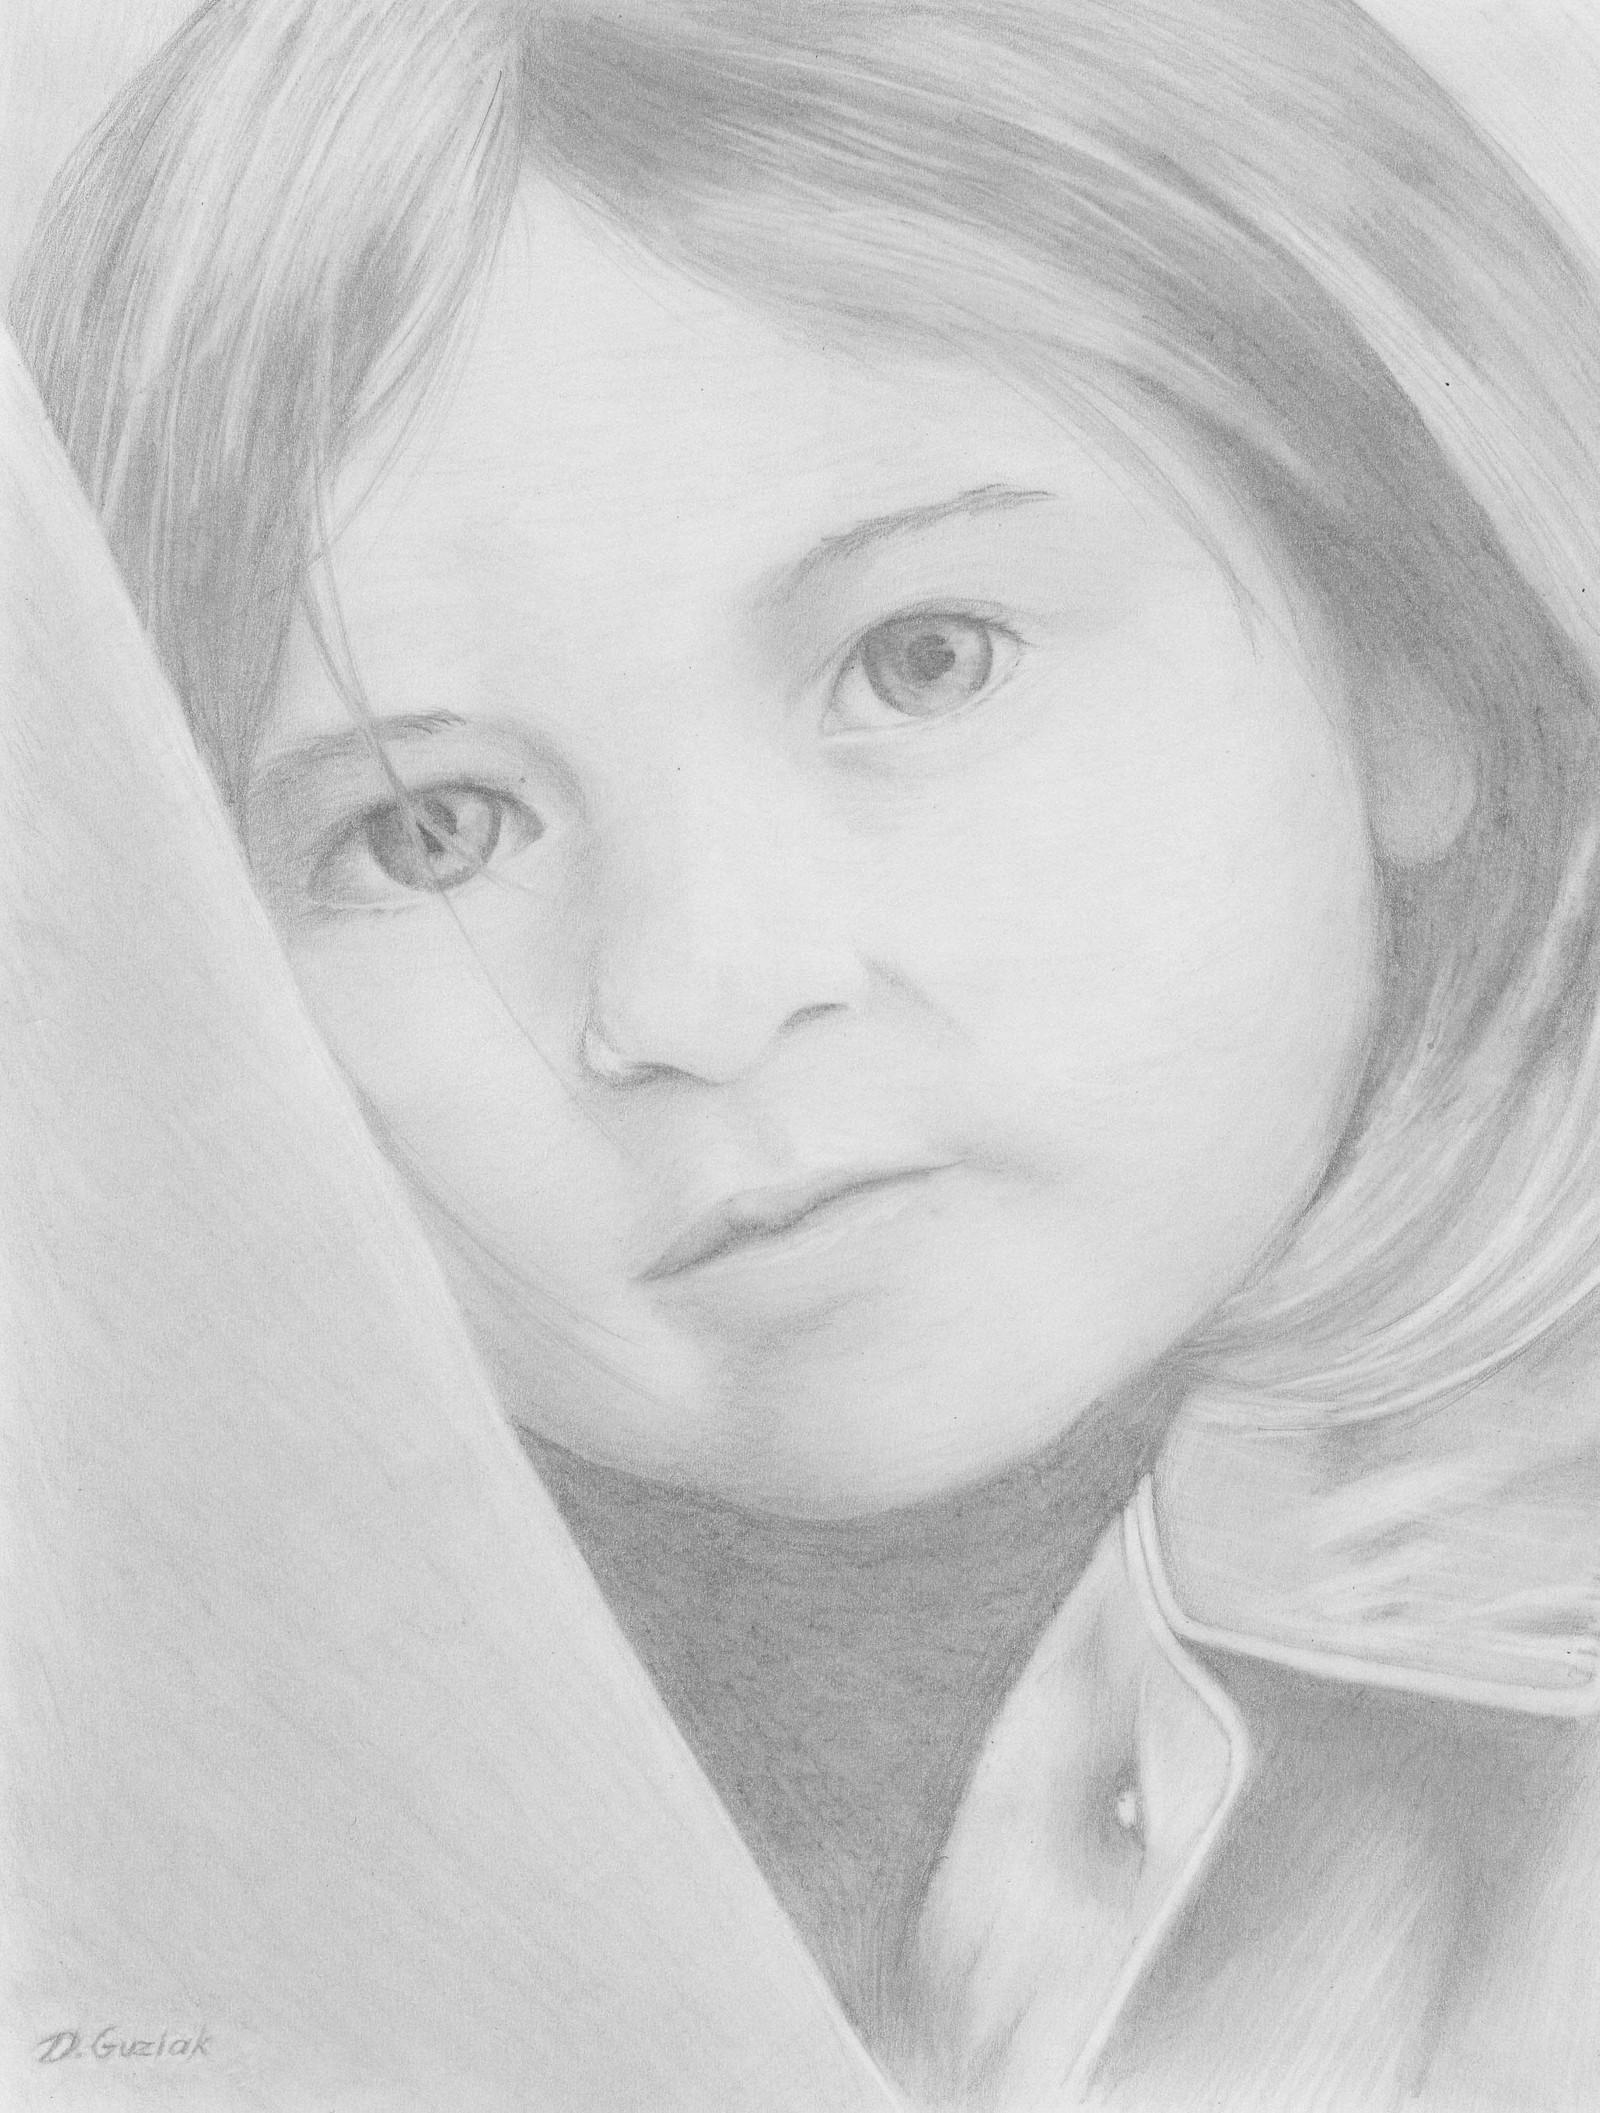 Just little girl.